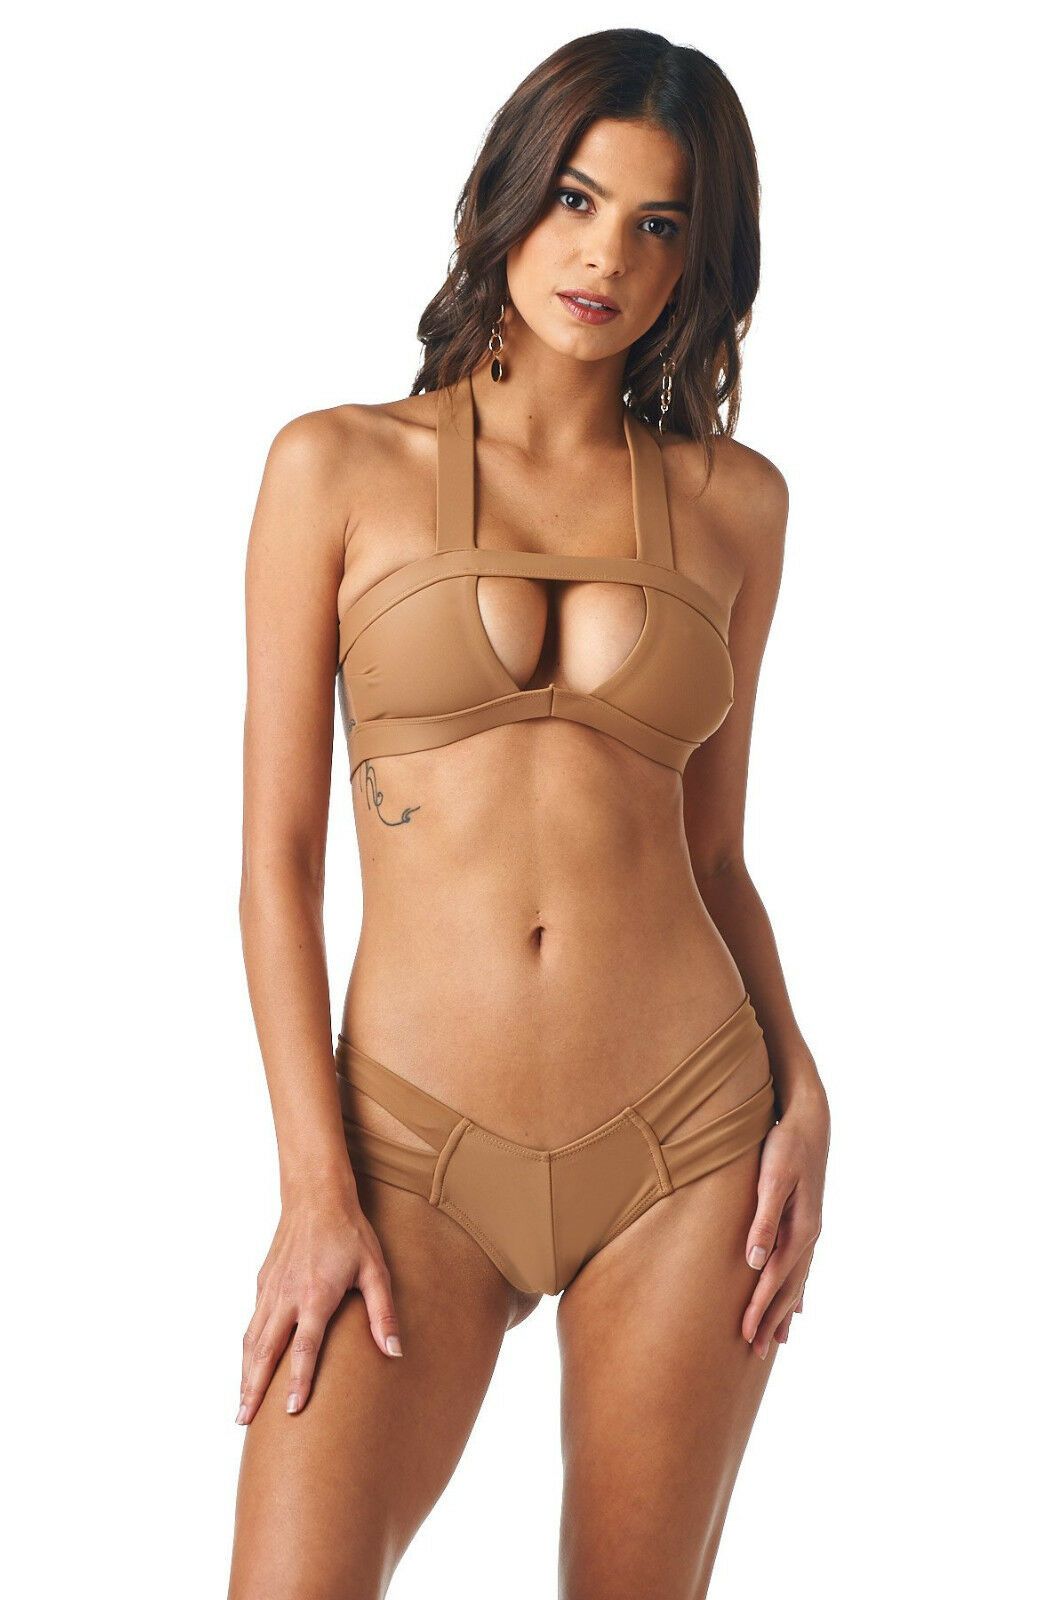 Sexy Cut Out Montce Bikini Swimsuit in Cappuccino Tan Brown Taupe - Size Medium